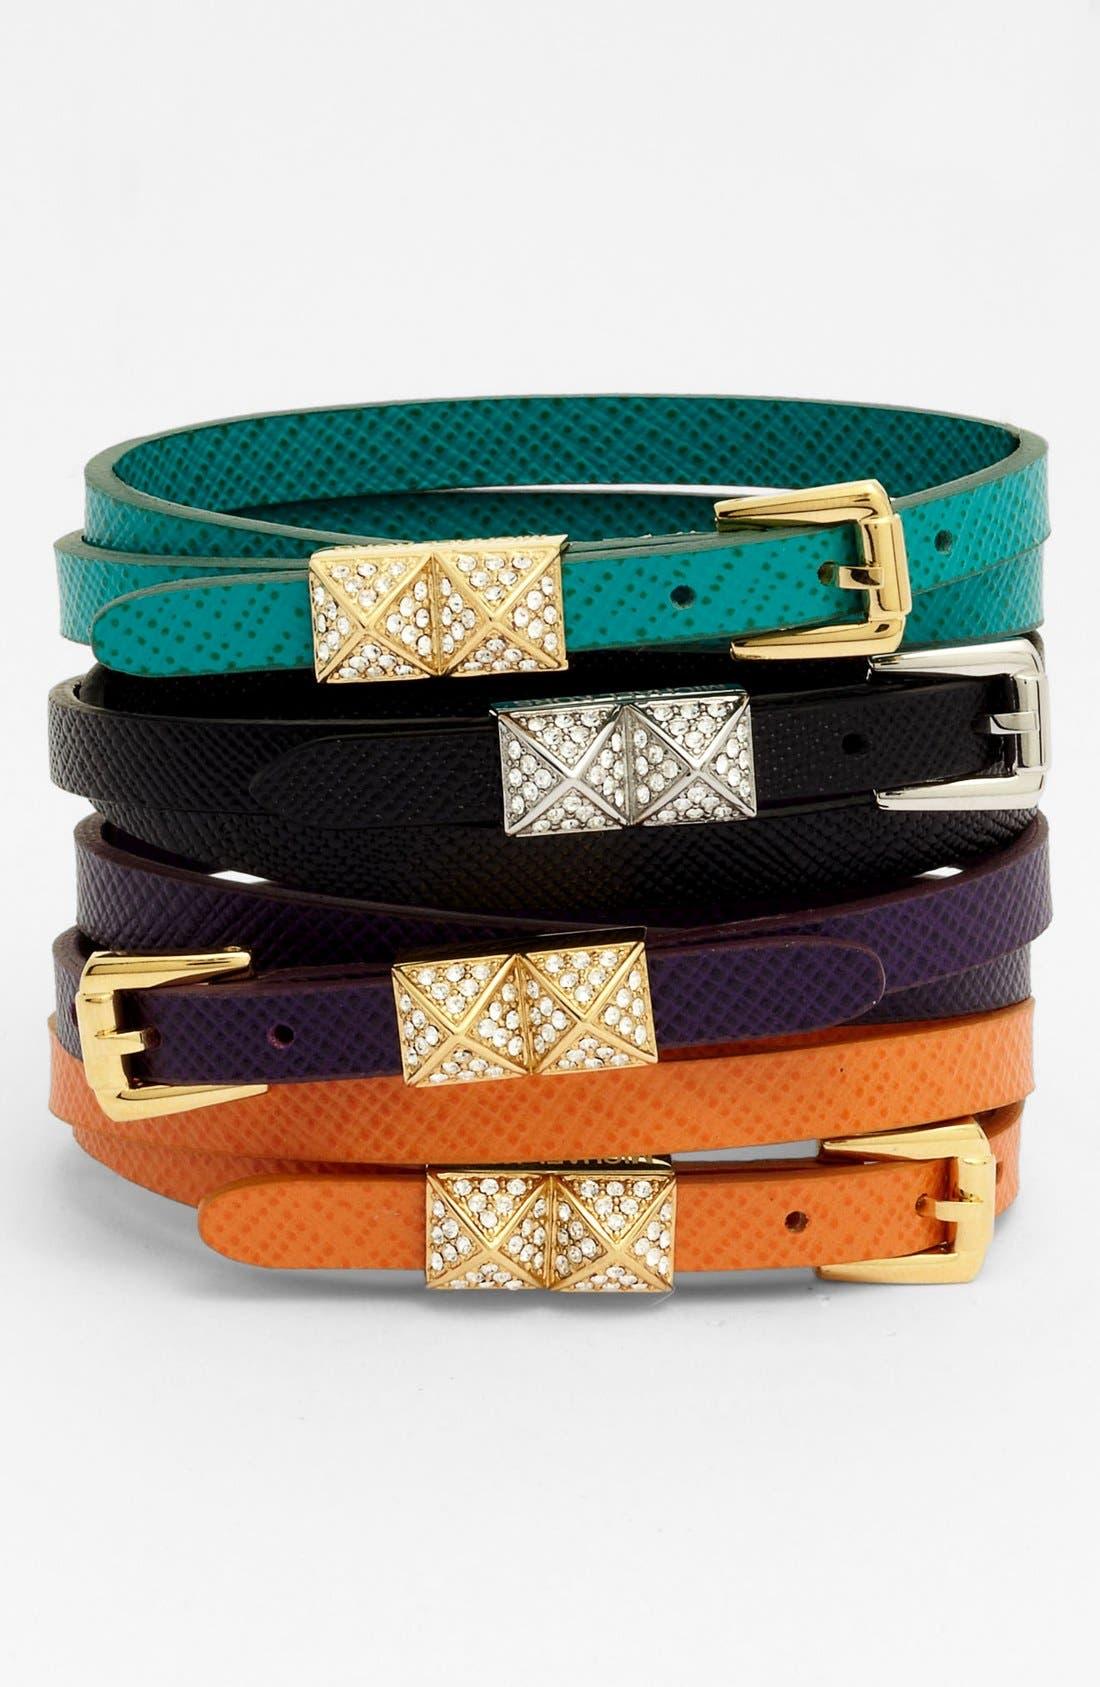 Alternate Image 1 Selected - Michael Kors Leather Double Wrap Bracelet (Nordstrom Exclusive)